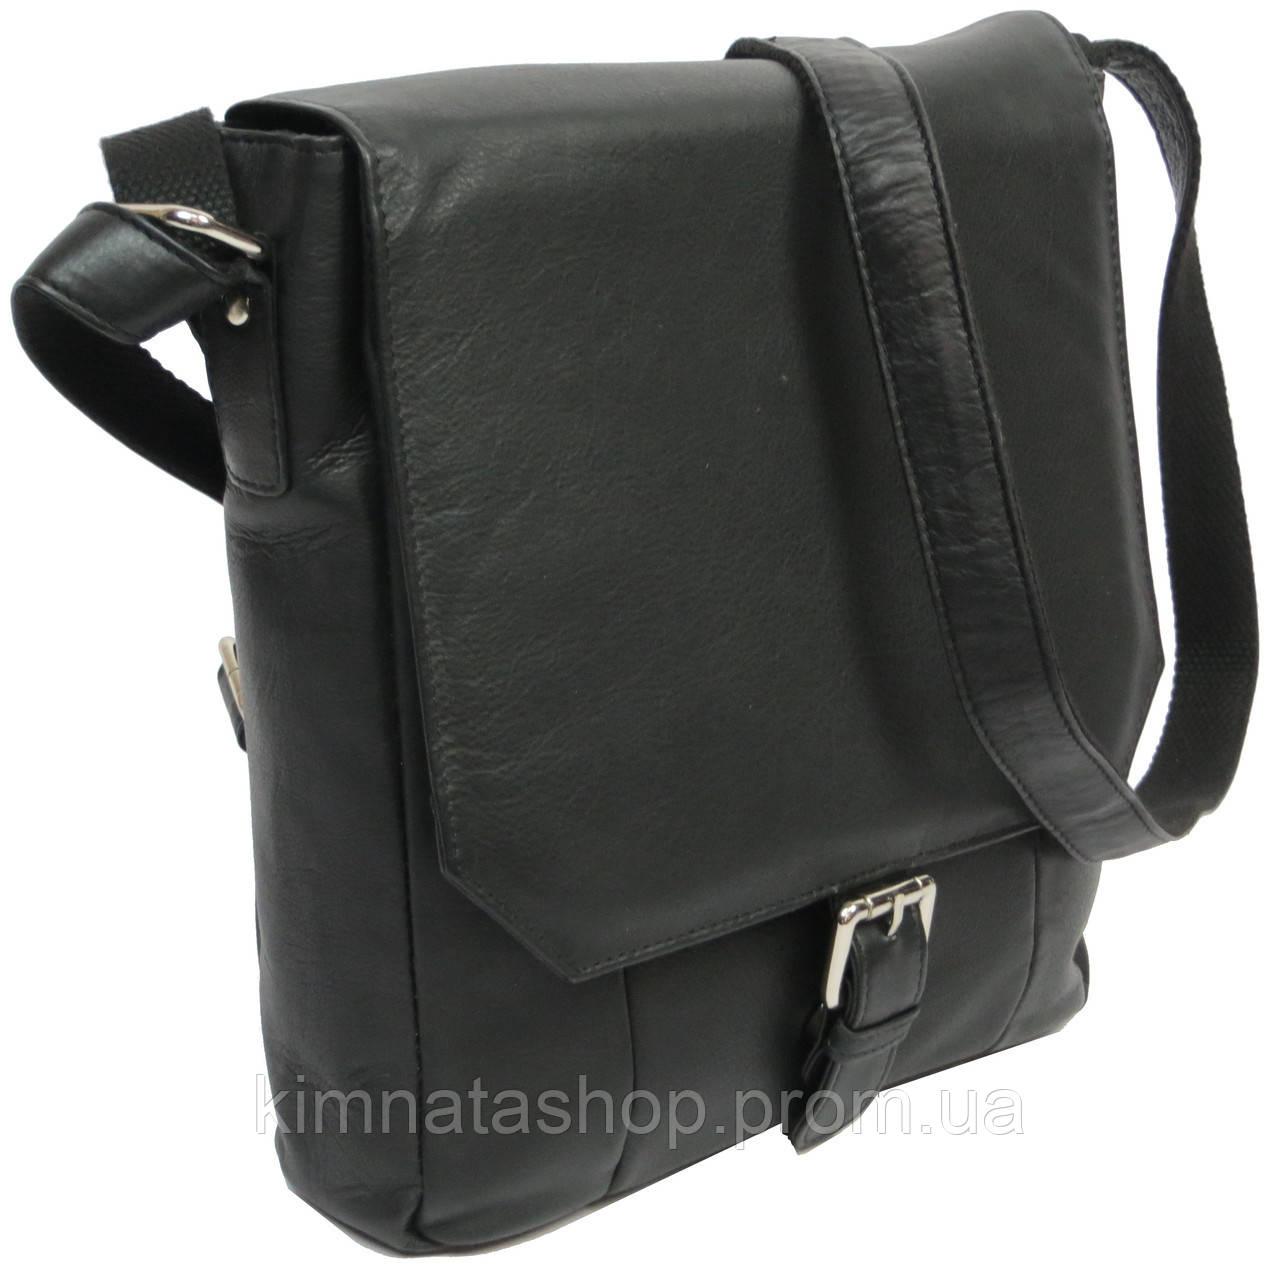 bd0d411f8f96 Кожаная мужская сумка-плантешка Always Wild 5747-1-spn черный Размеры:  26х27х8